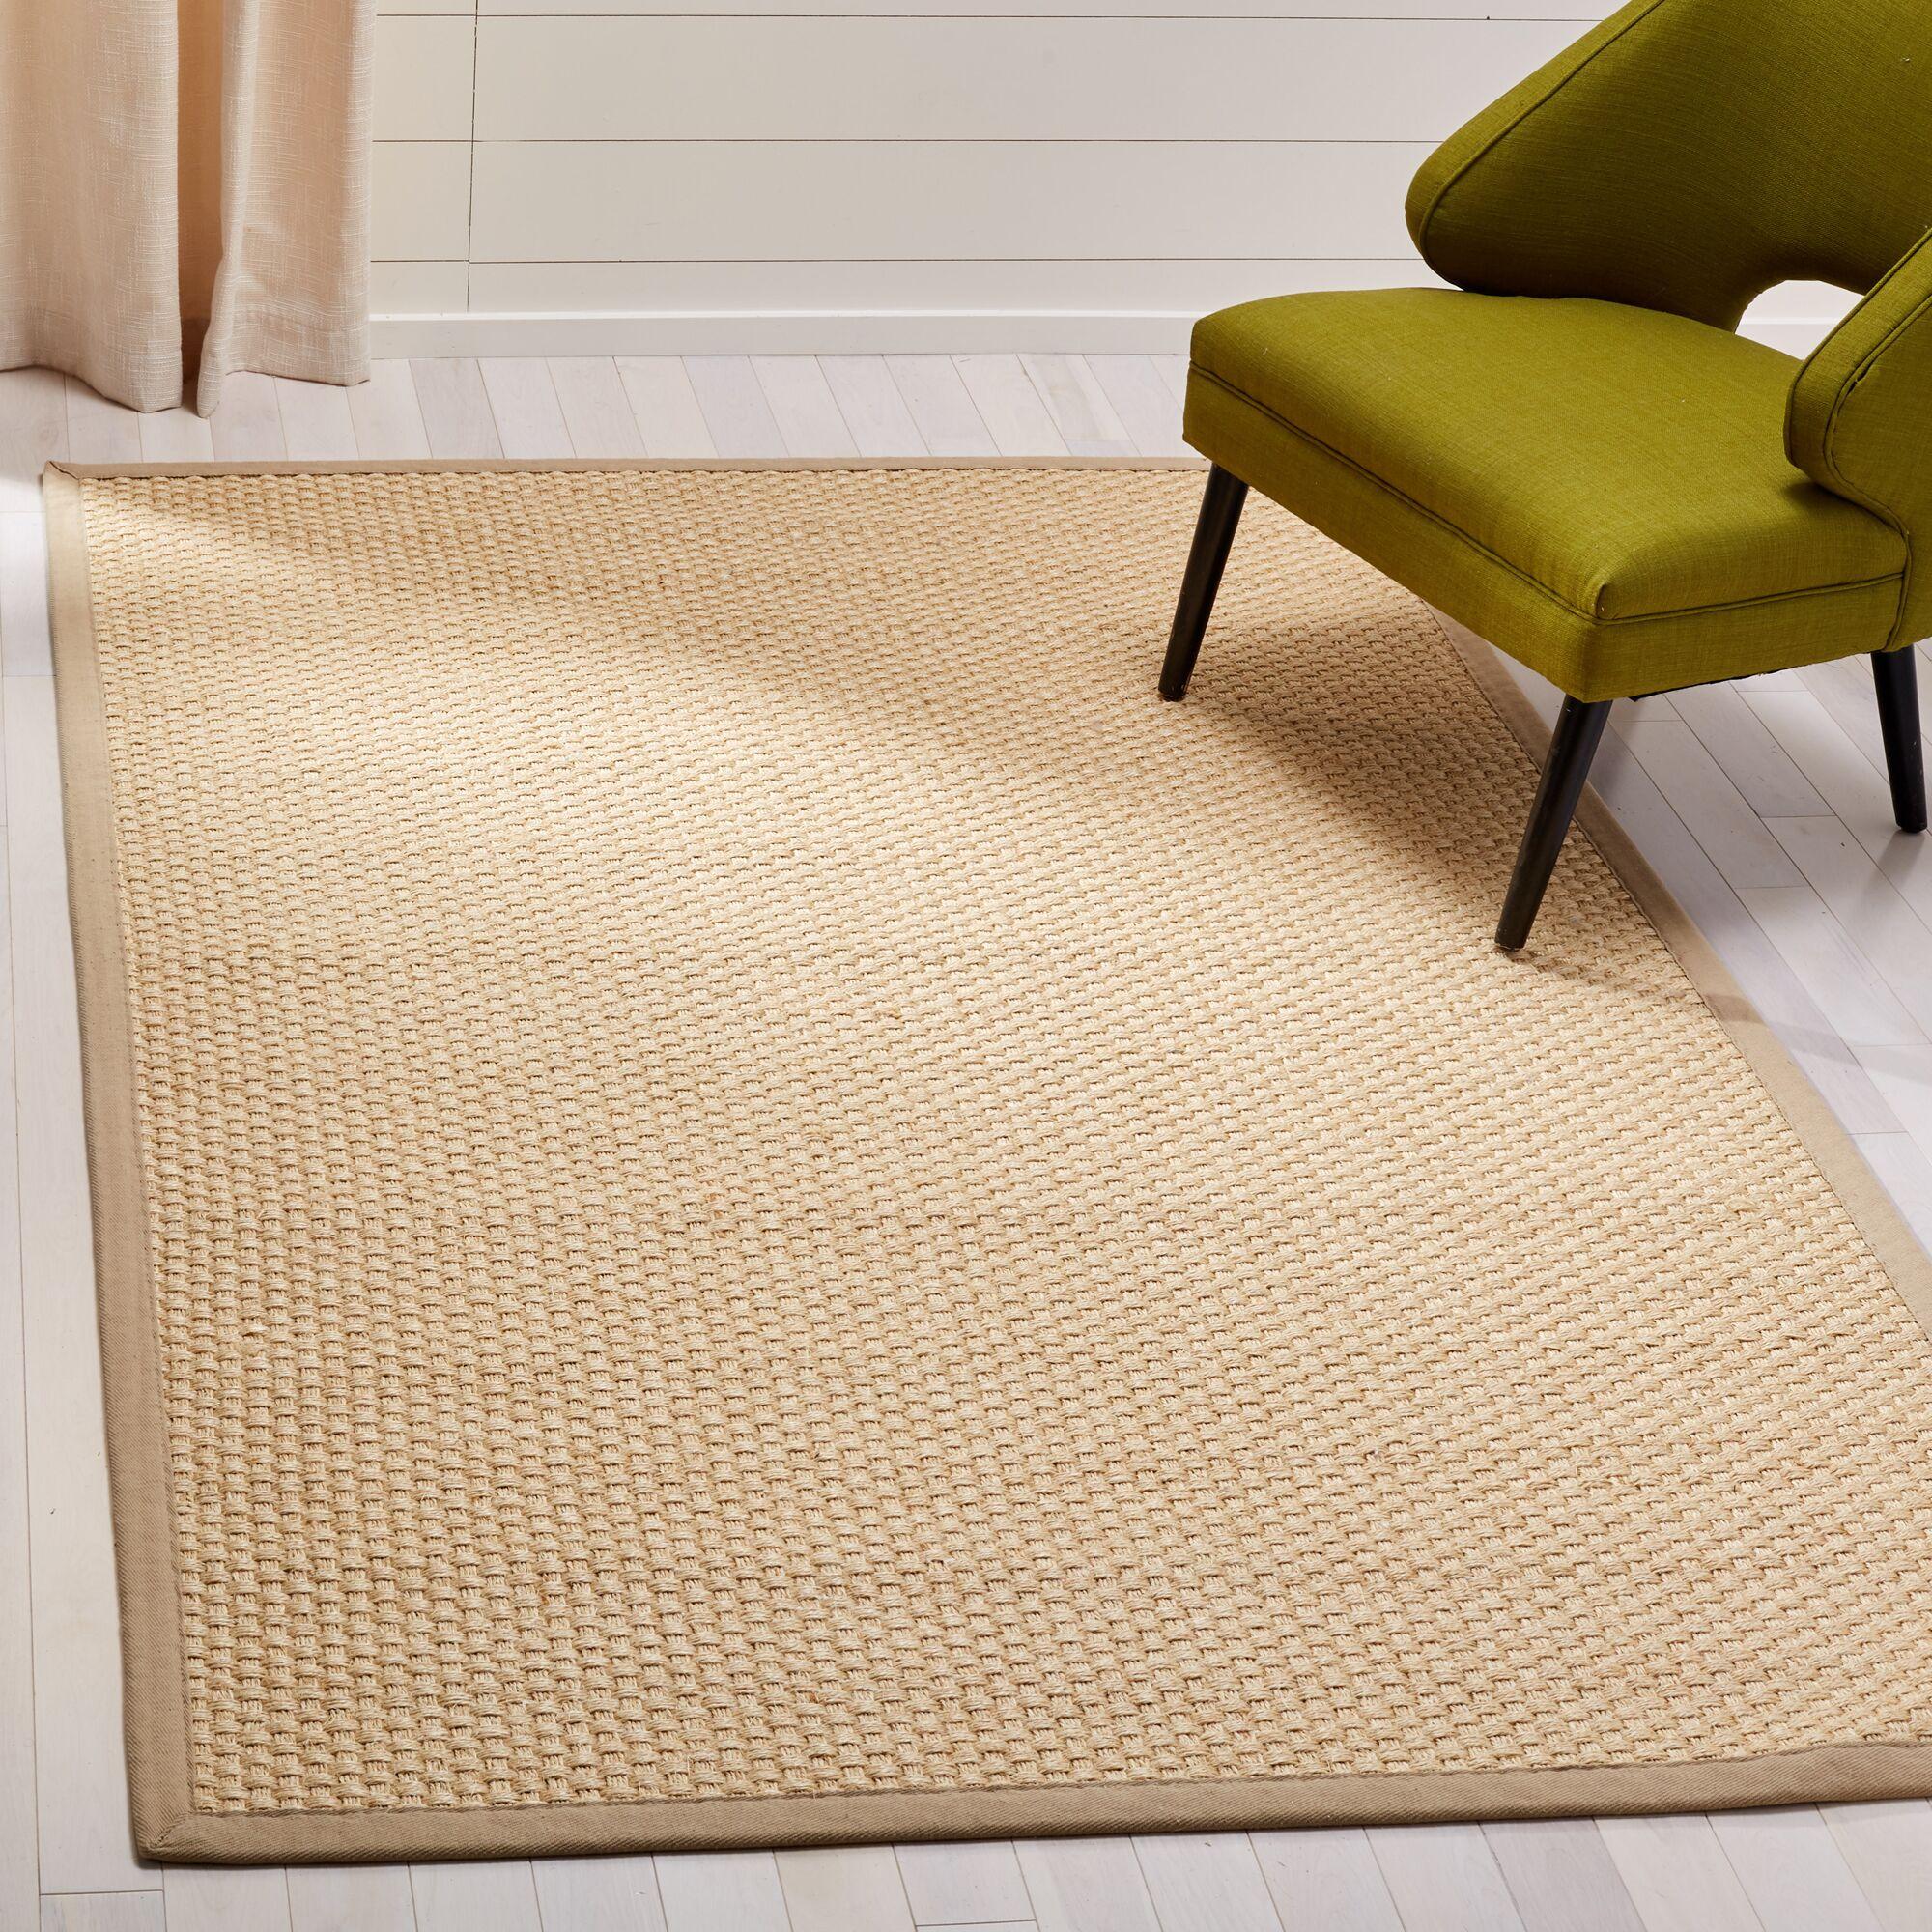 Chalfant Beige Area Rug Rug Size: Rectangle 6' x 9'